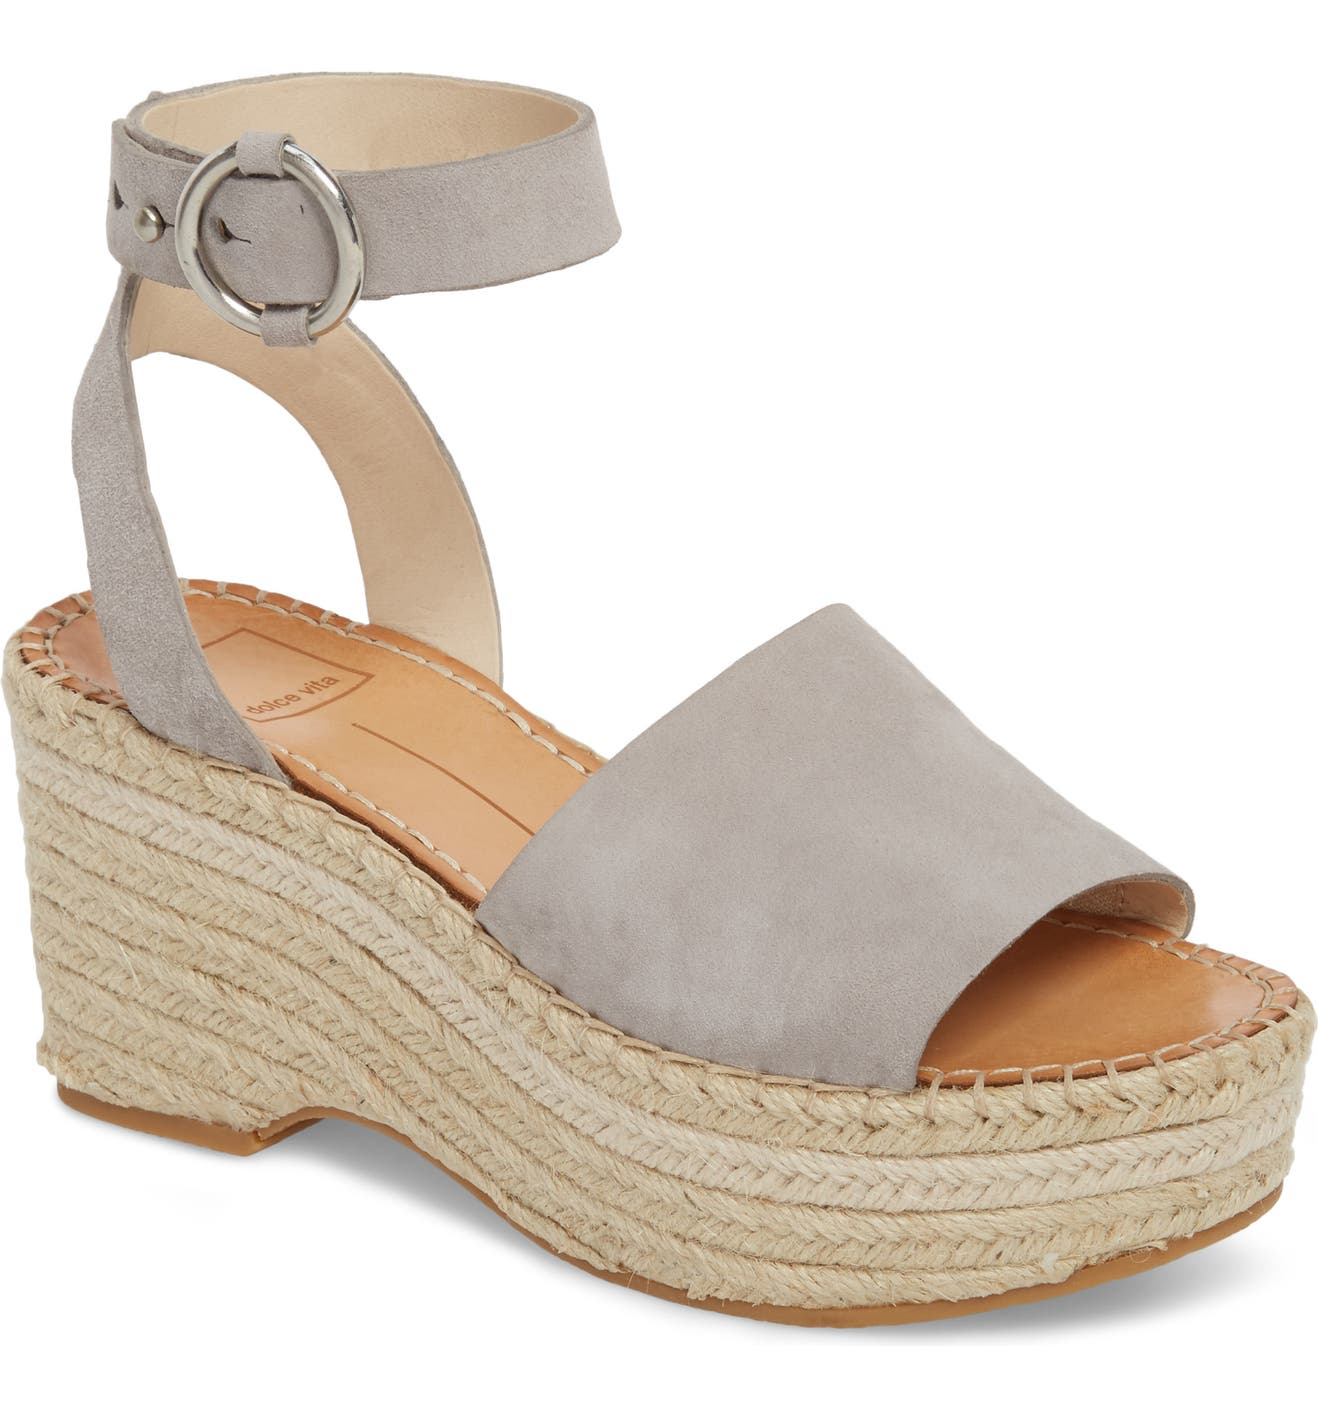 65f49331fc7 Dolce Vita Lesly Espadrille Platform Sandal (Women)